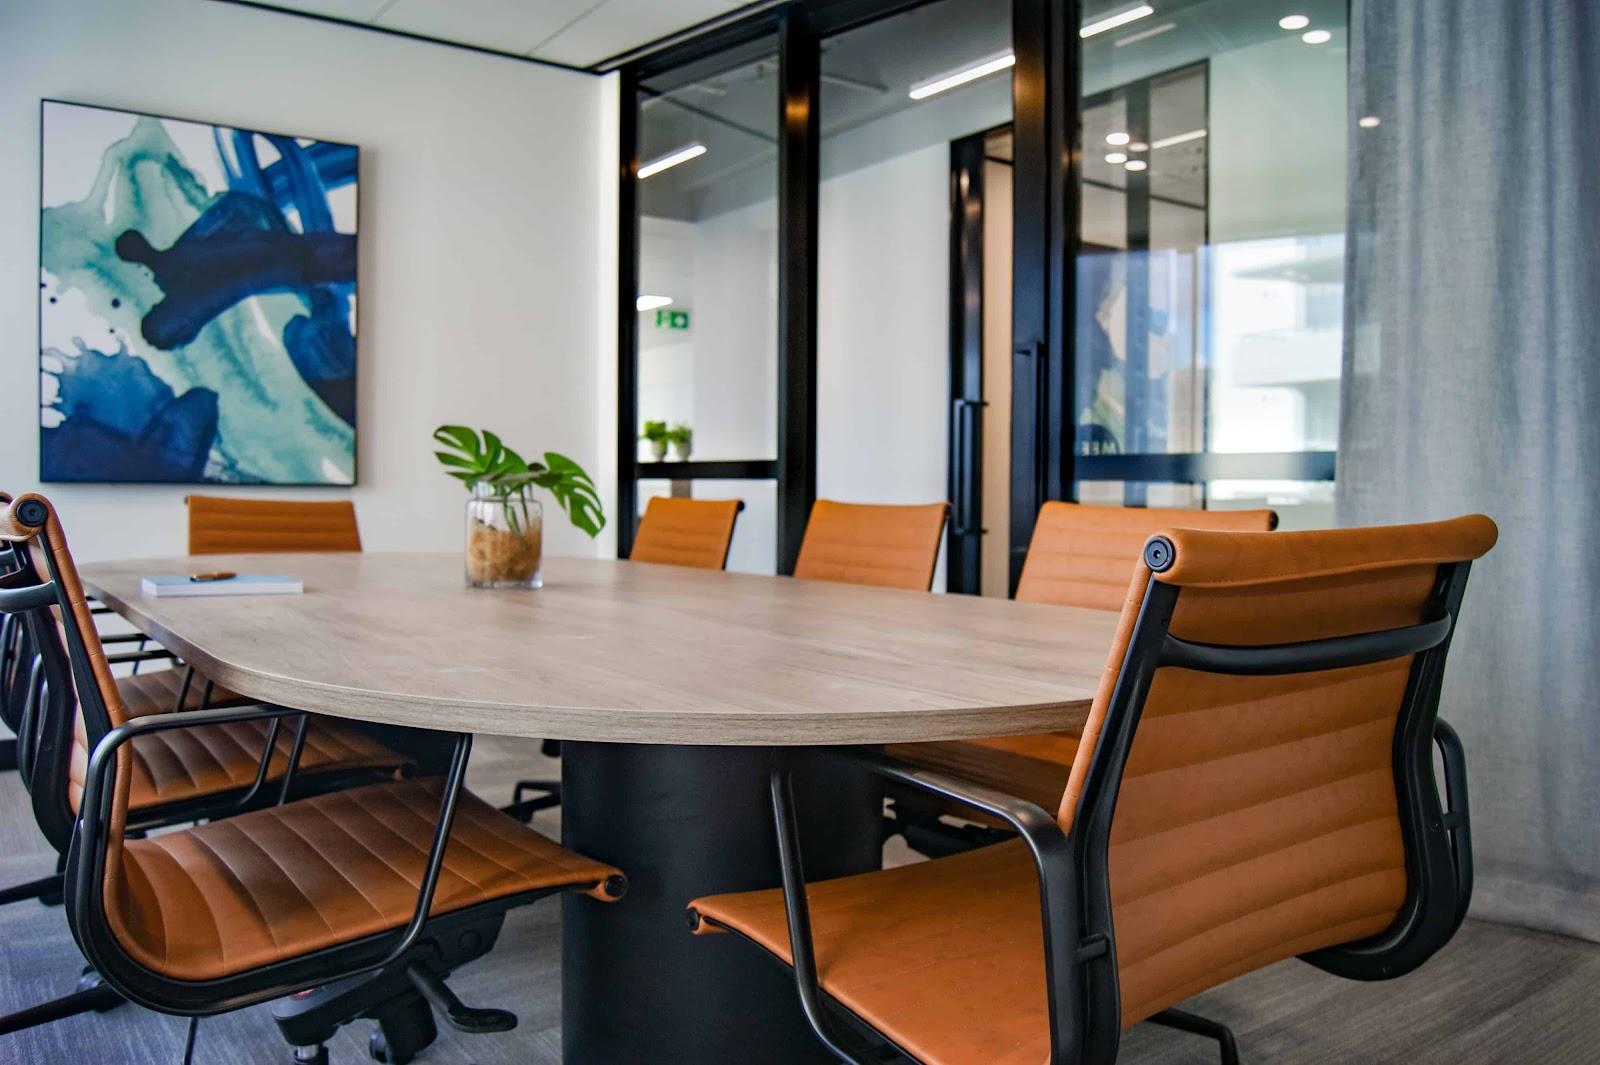 Meeting Room In A Premium Virtual Office